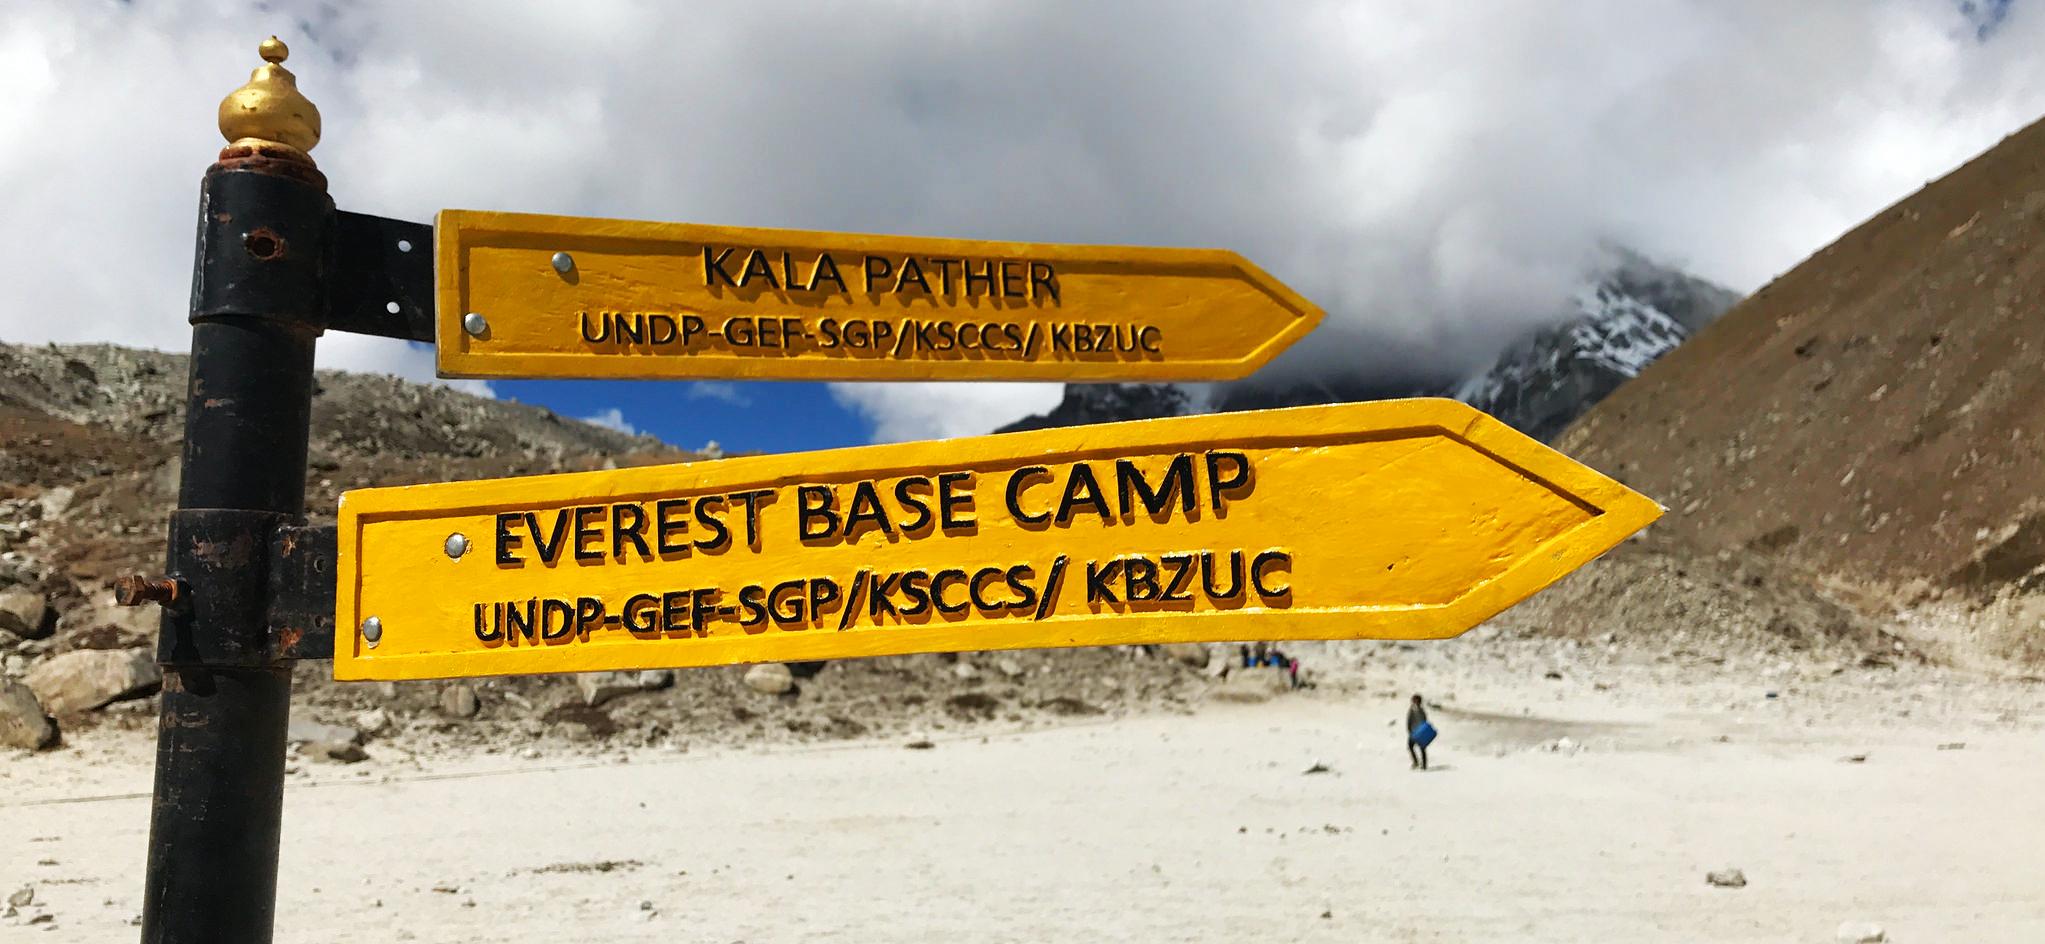 EBC健行∣高丘湖與聖母峰基地營EBC行前準備、規劃與花費。 @飯糰五號的旅遊狂想+